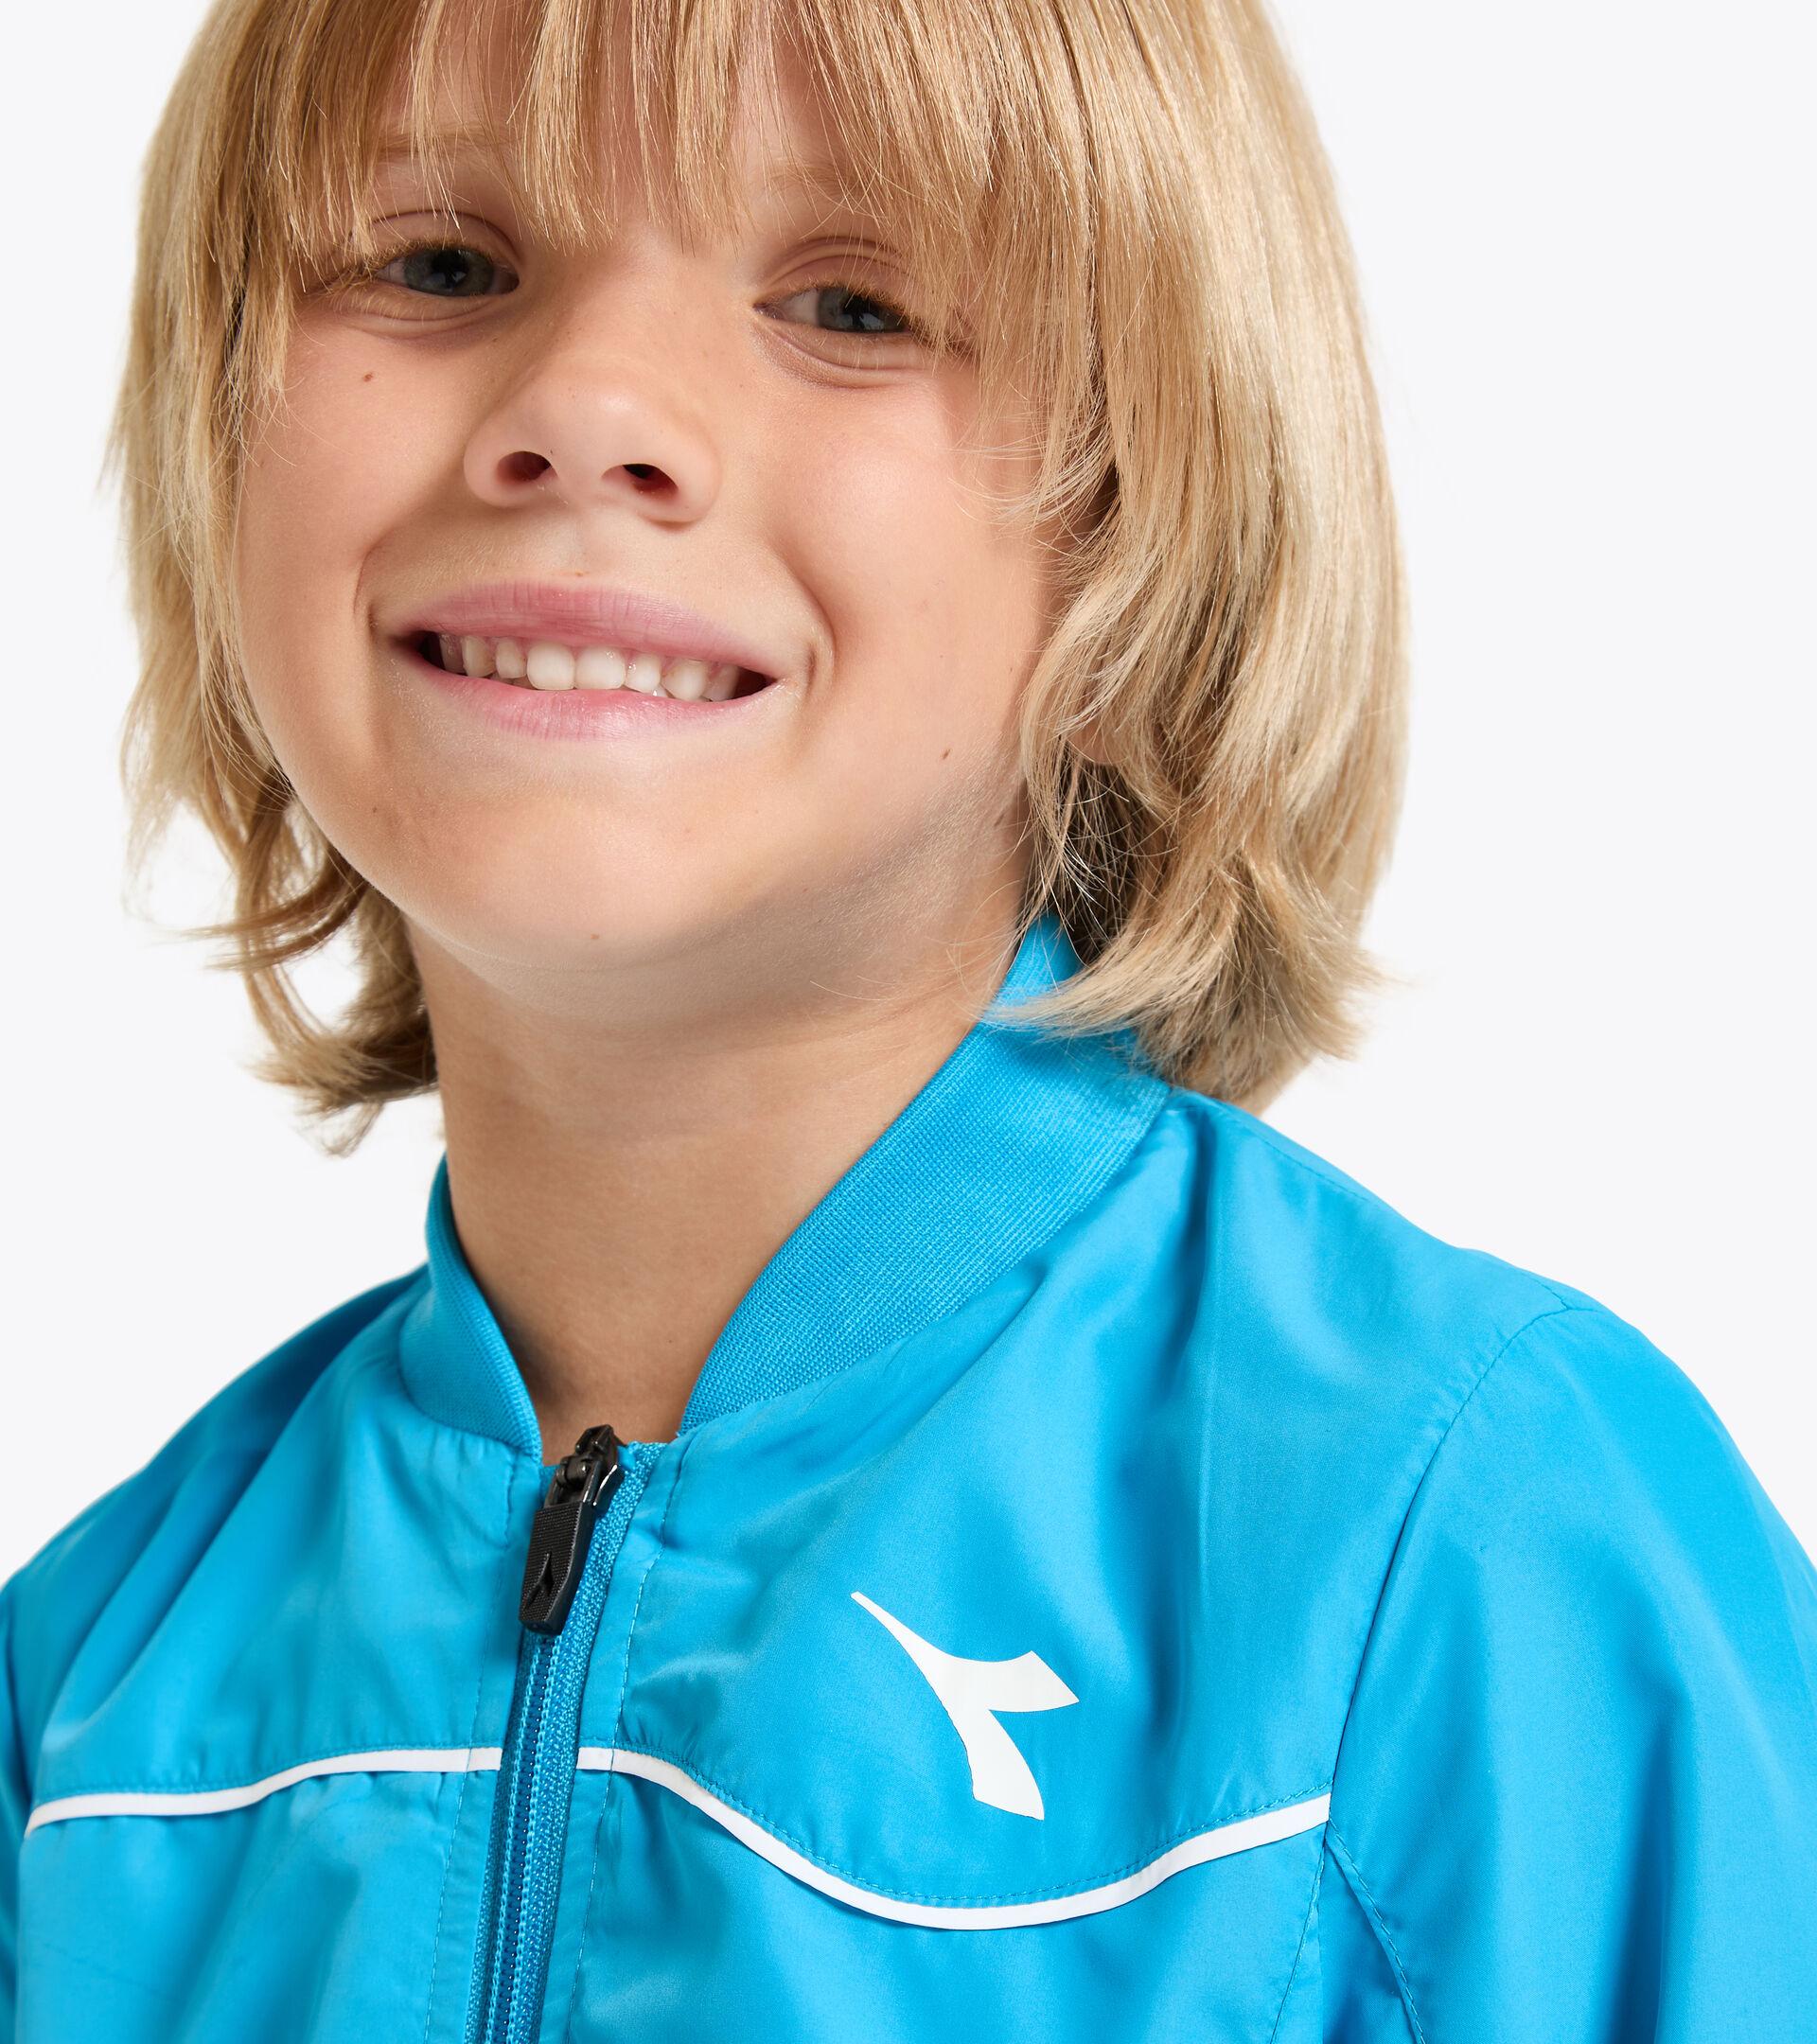 Giacca da tennis - Bambino J. JACKET COURT AZZURRO FLUO - Diadora